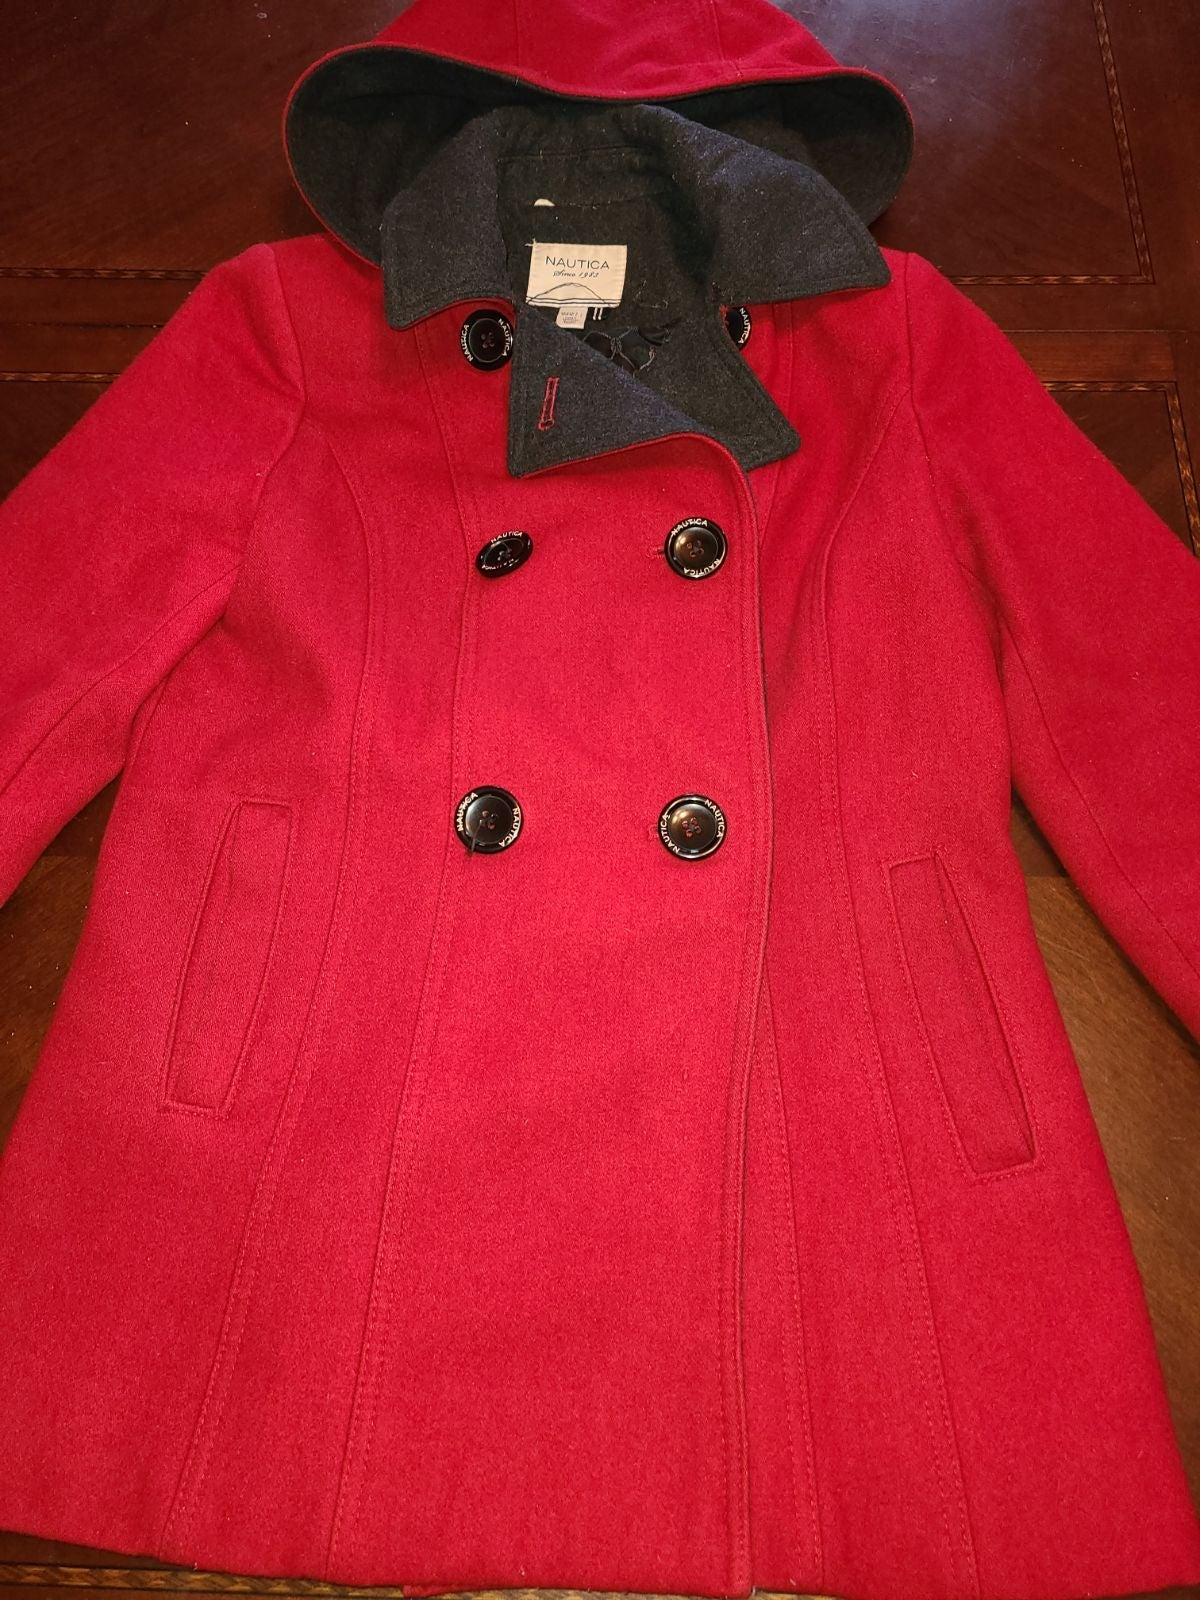 Nautica Coat women's red